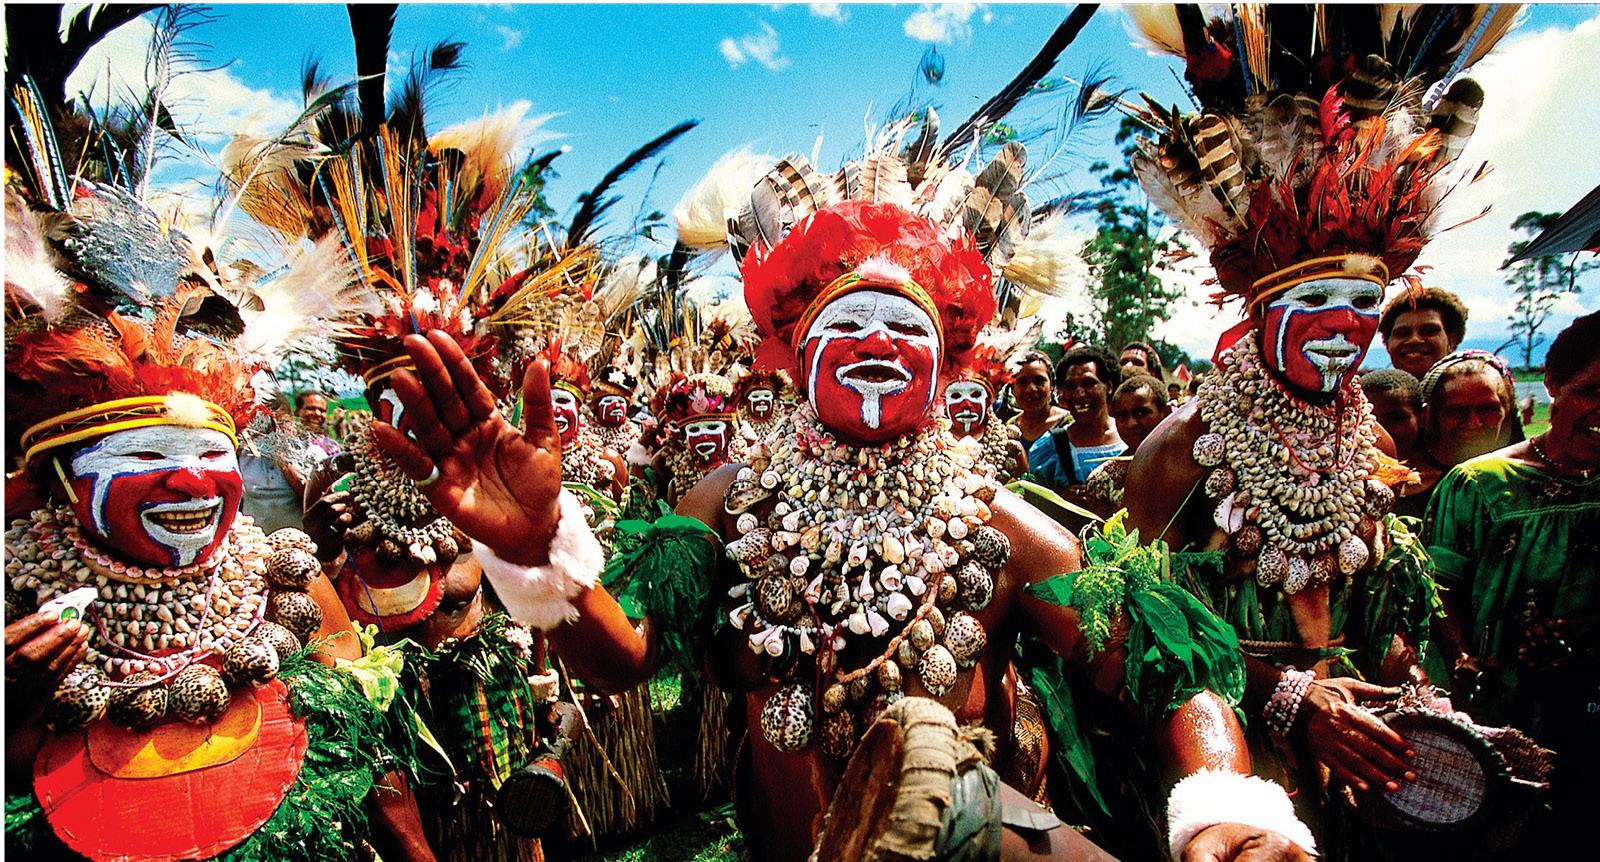 Papua New Guinea traditional tribes men carrying out dancing ritual